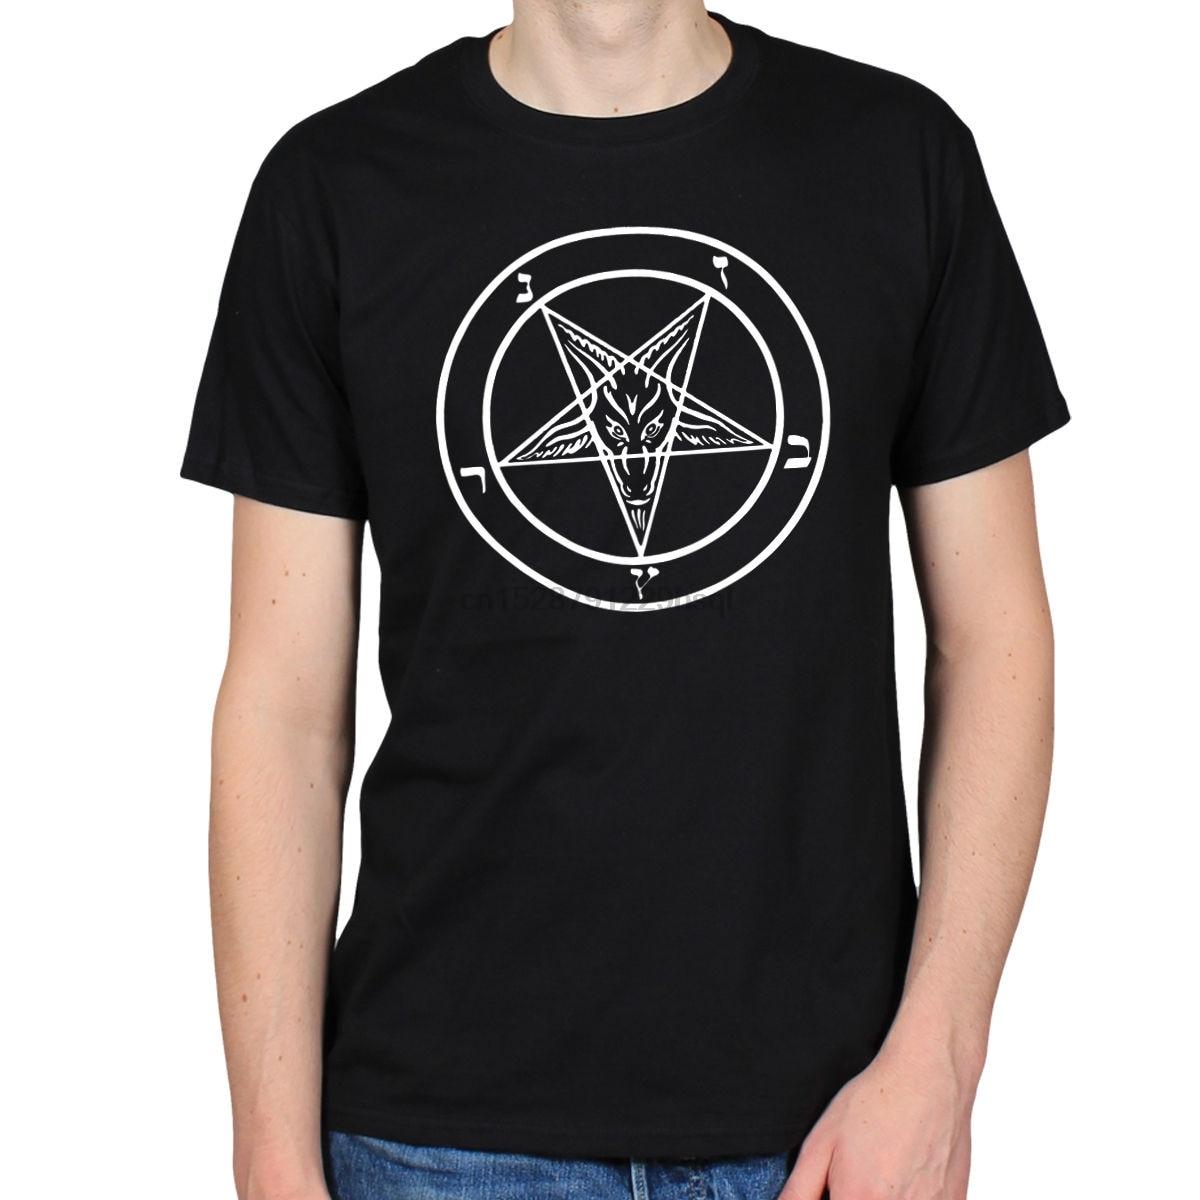 Pentagram T-Shirt Womens Ladies rock goth punk jumper metal gothic satanic